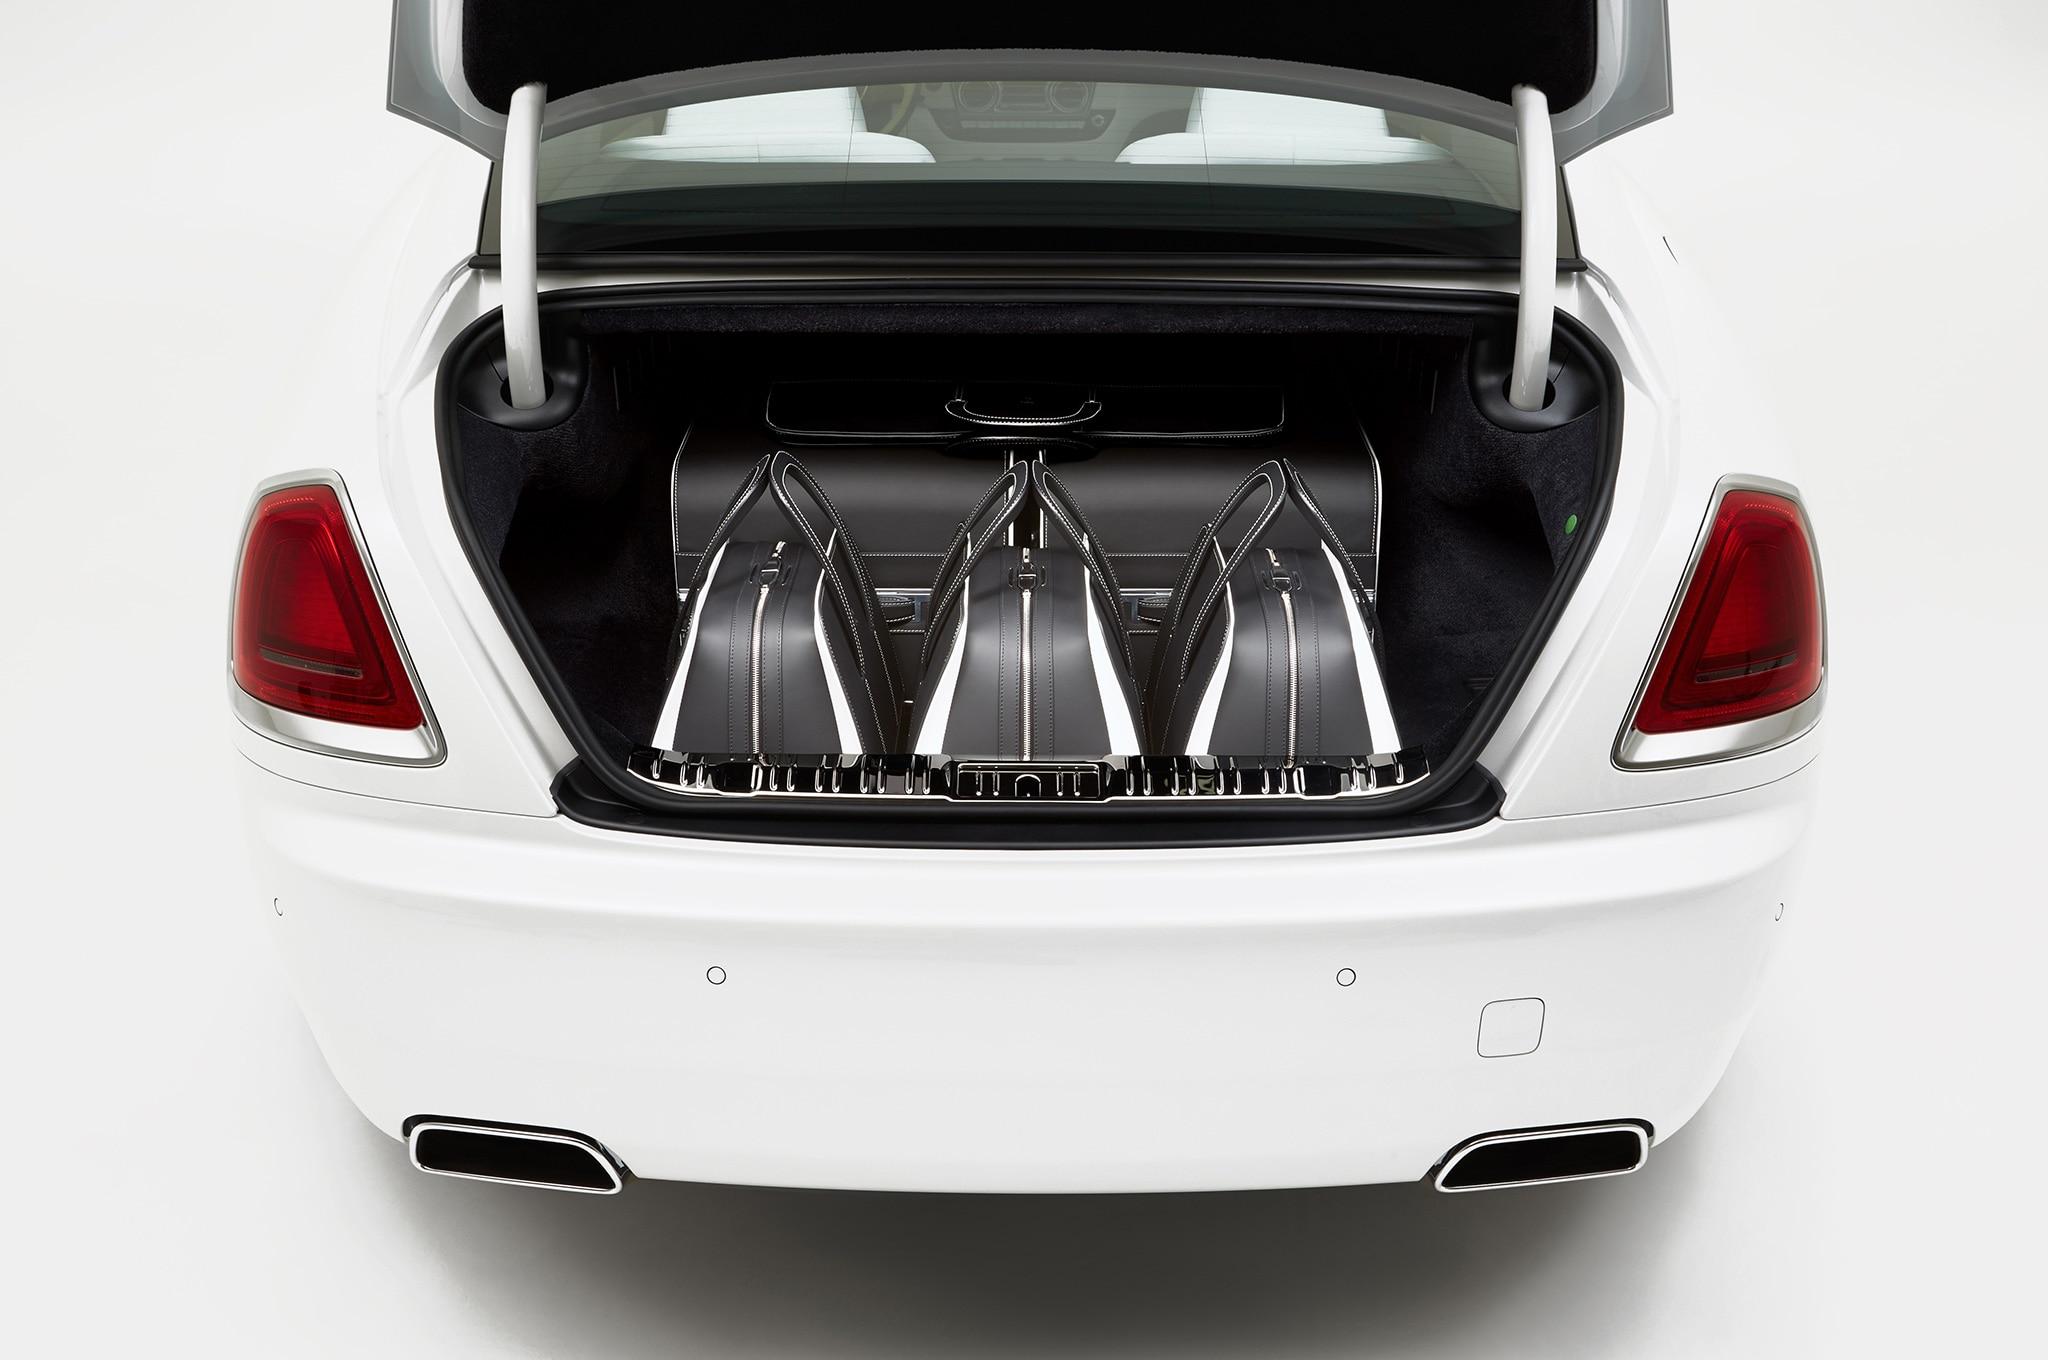 Rolls Royce Wraith Luggage Set 1